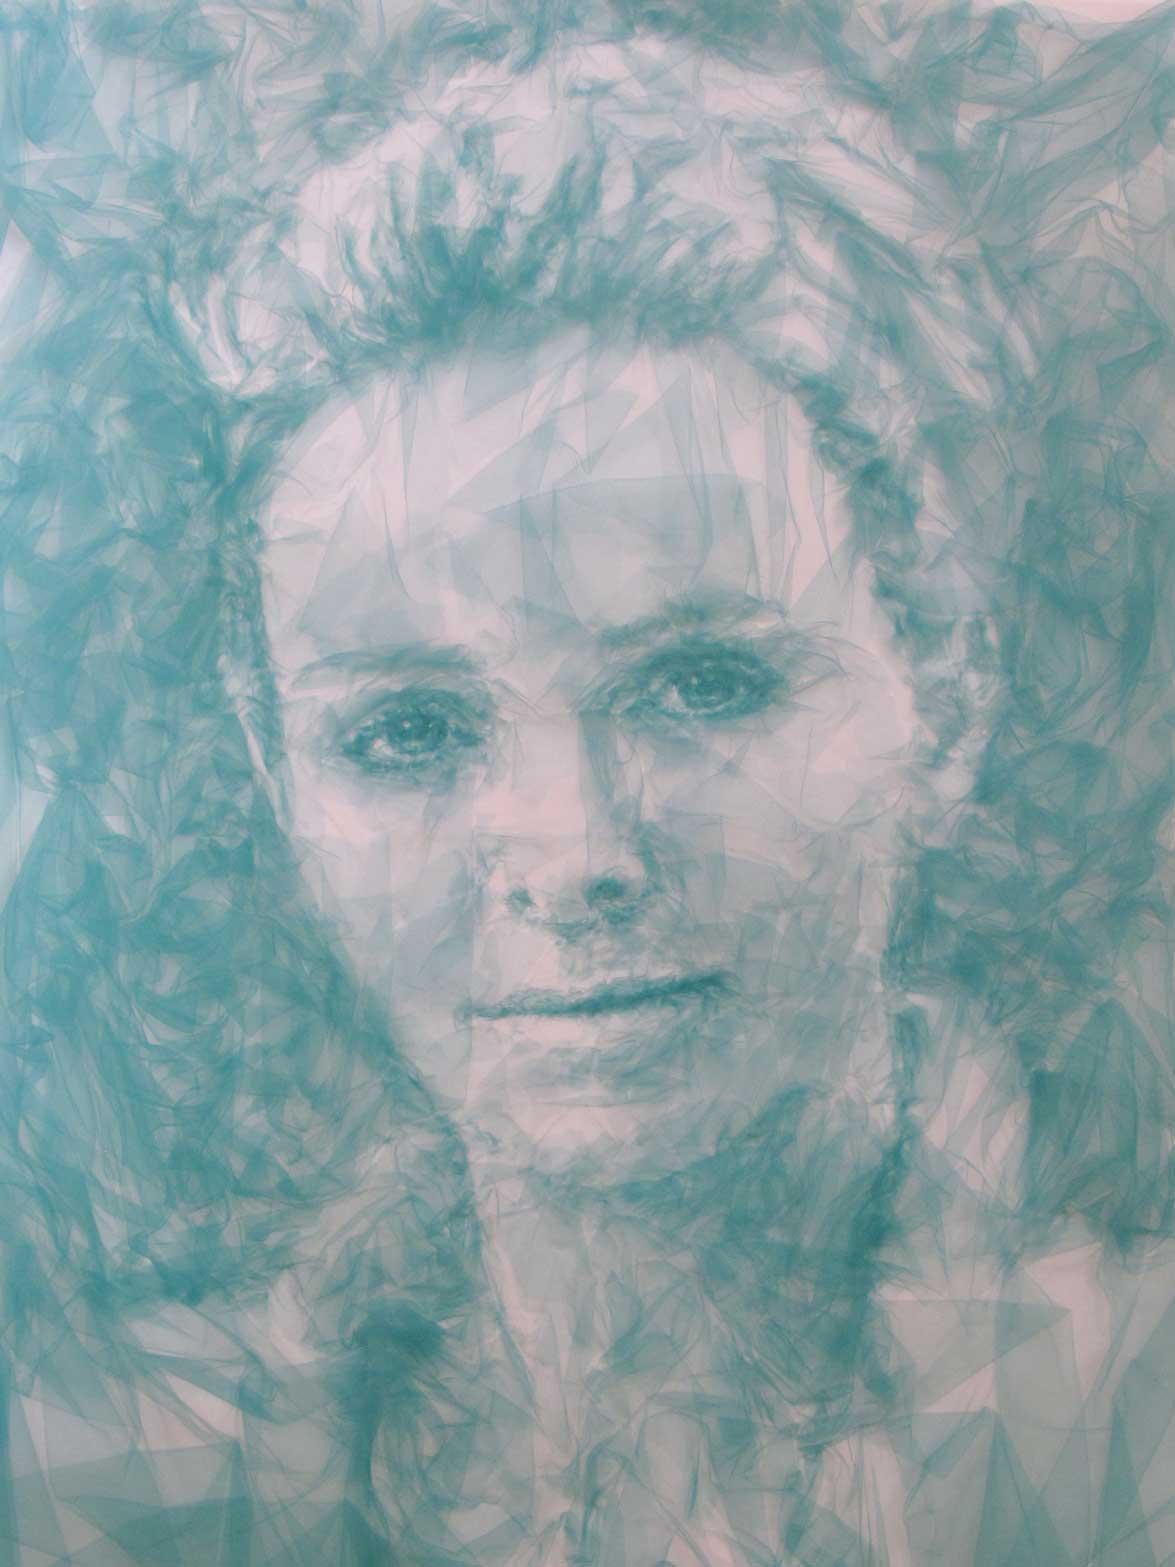 6.Princesse-Charlene-Tulle-Portrait